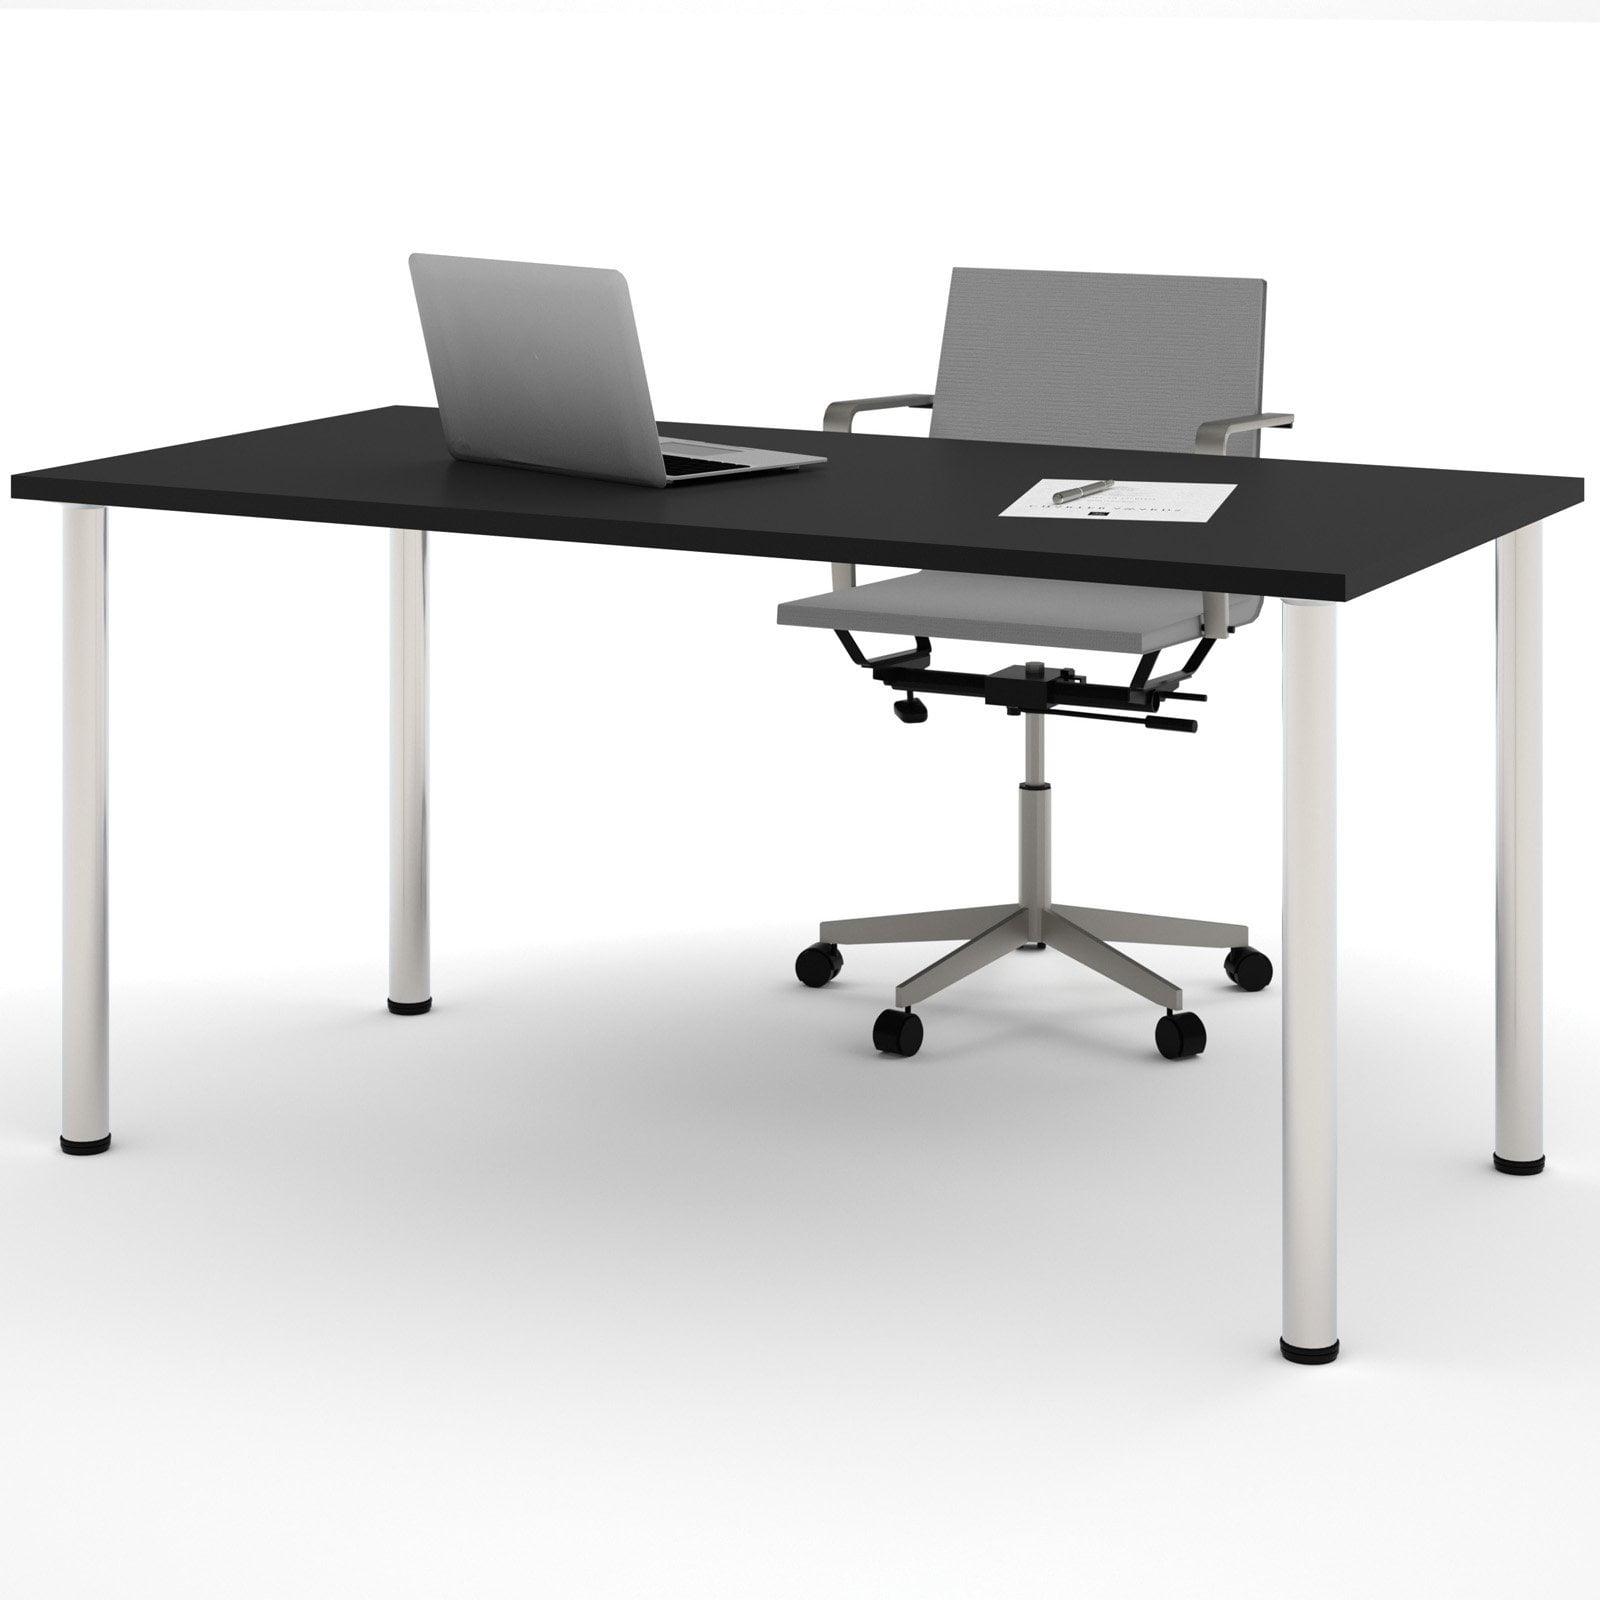 "Bestar 30"" x 60"" Table with round metal legs in Black by Bestar"